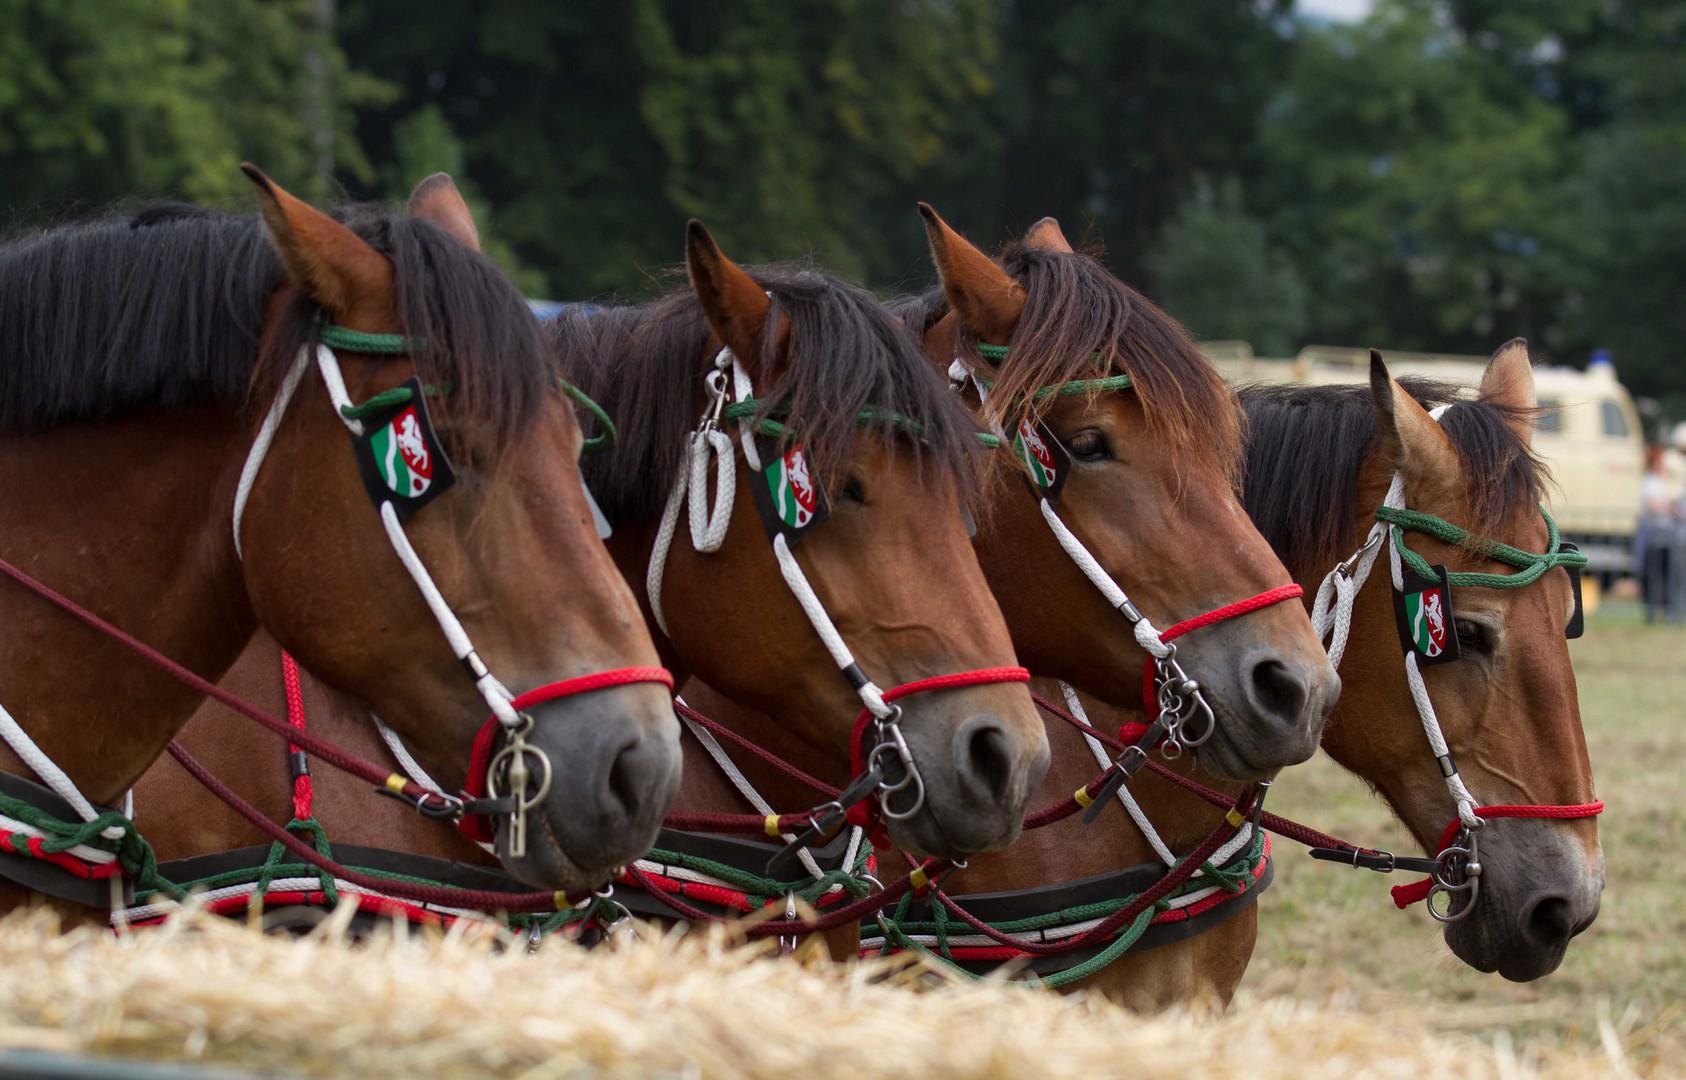 Starke Pferde VII